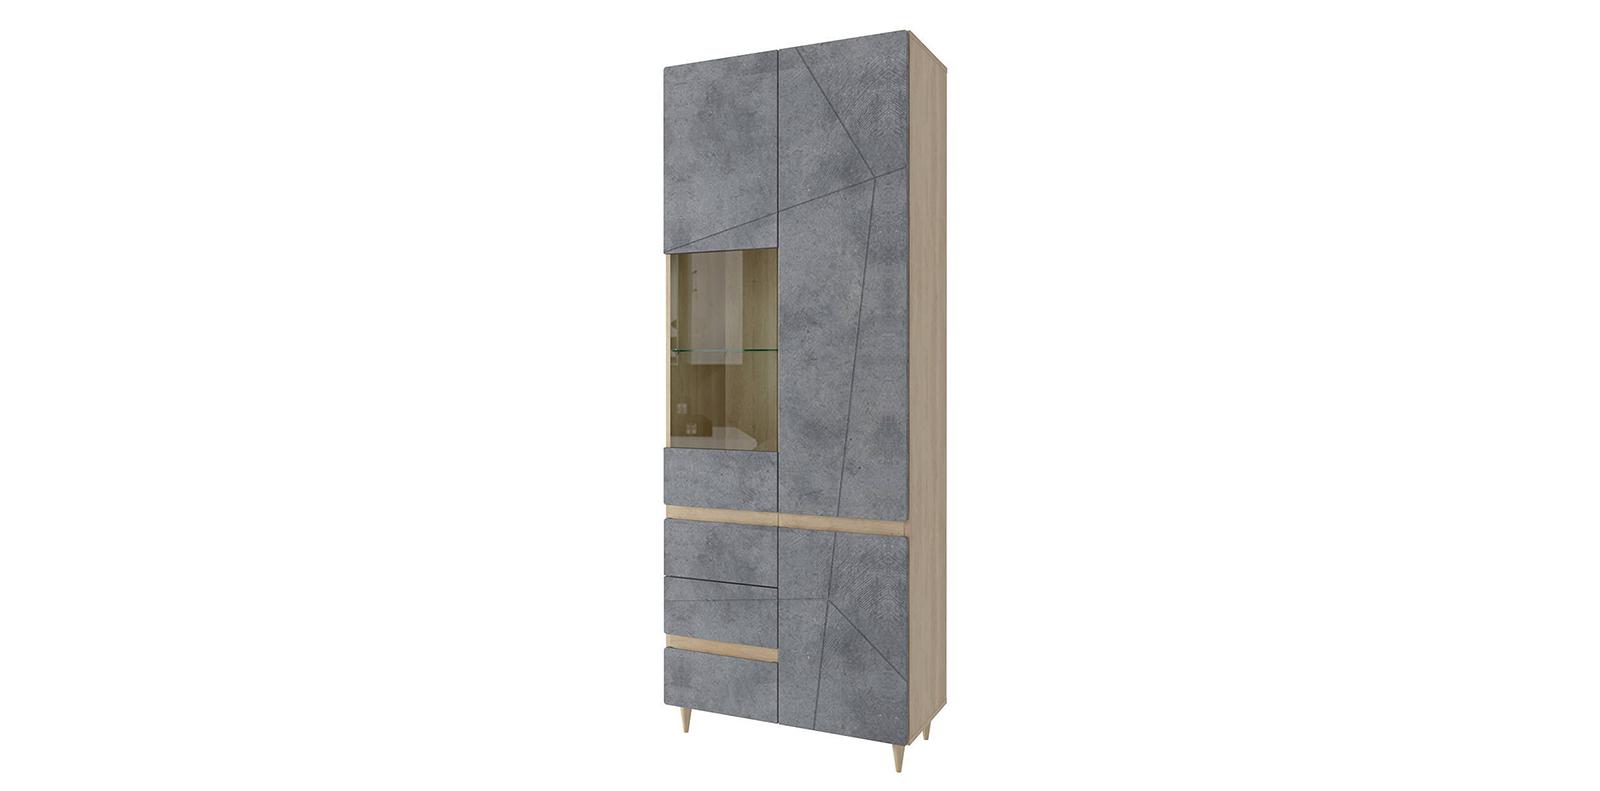 Шкаф распашной двухдверный Монца Шкаф со стеклом Монца (дуб небраска/бетон тёмный) СТЛ.339.02